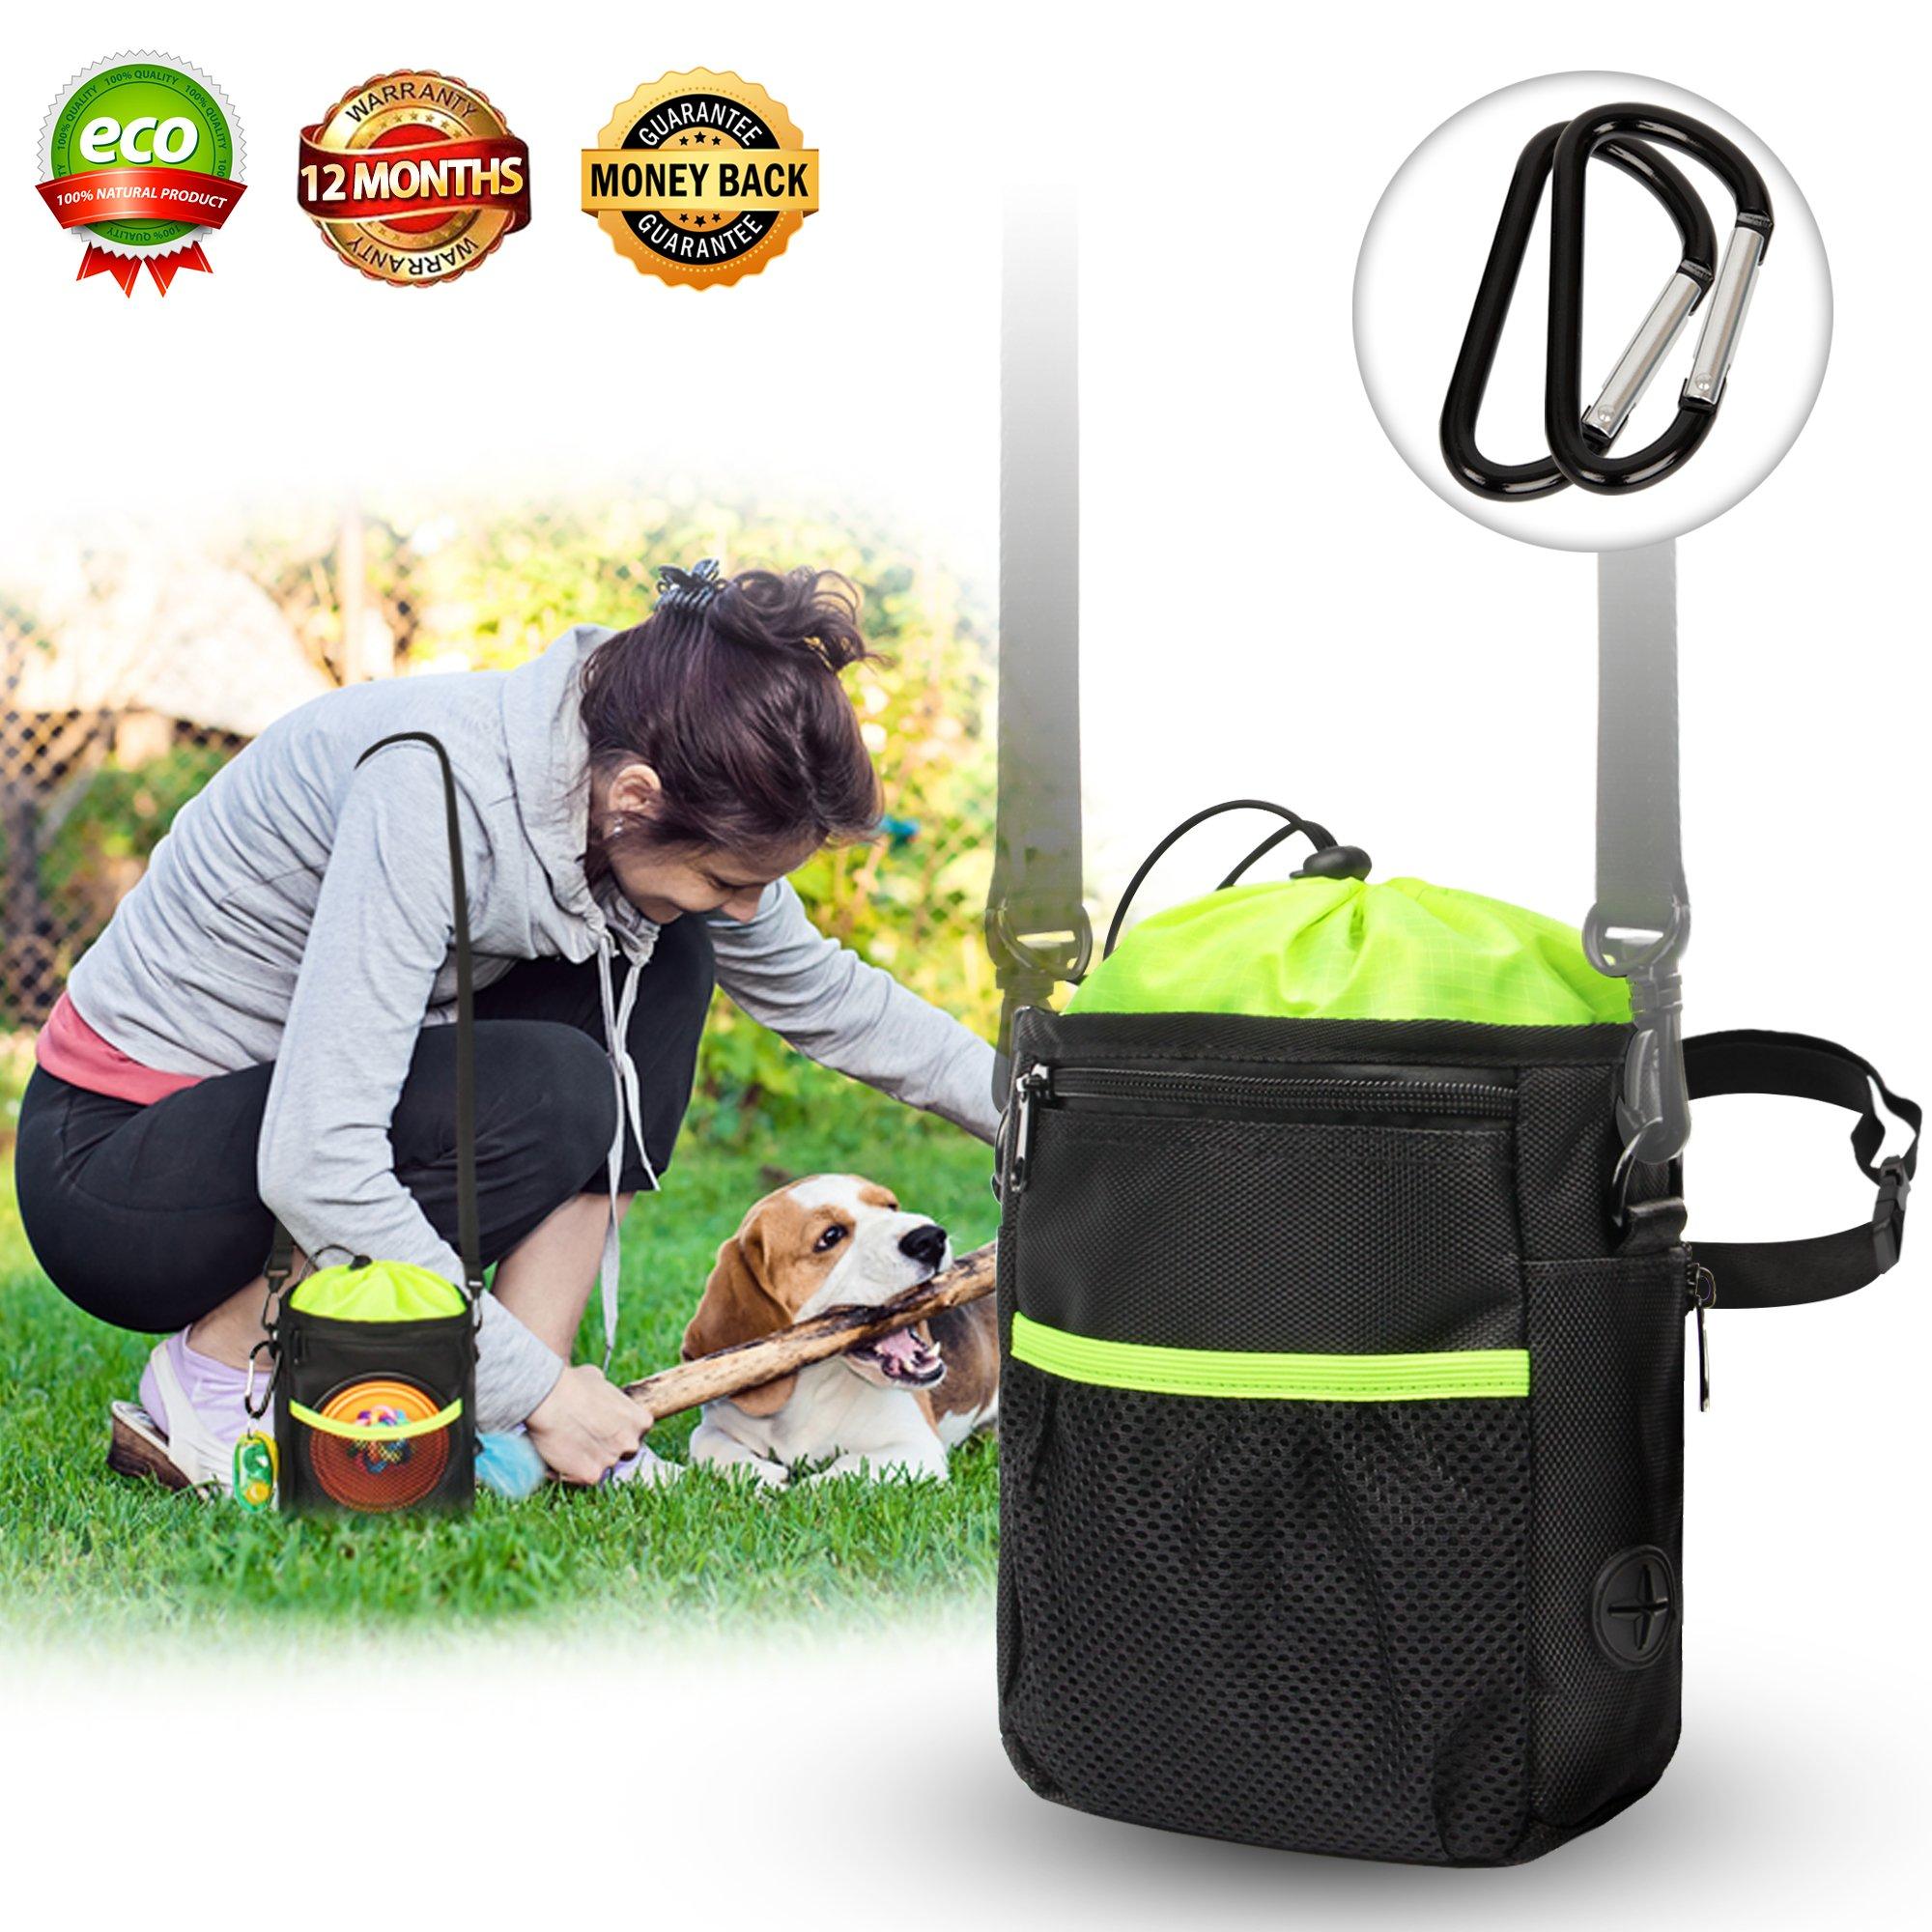 New Dog Treat Training Pouch bags - dog walking bag- Easily Carries Pet Toys, Kibble, Treats- Upgraded Adjustable - Removable Extra Long Waist Belt - Shoulder Strap - Improved Poop Bag Dispenser